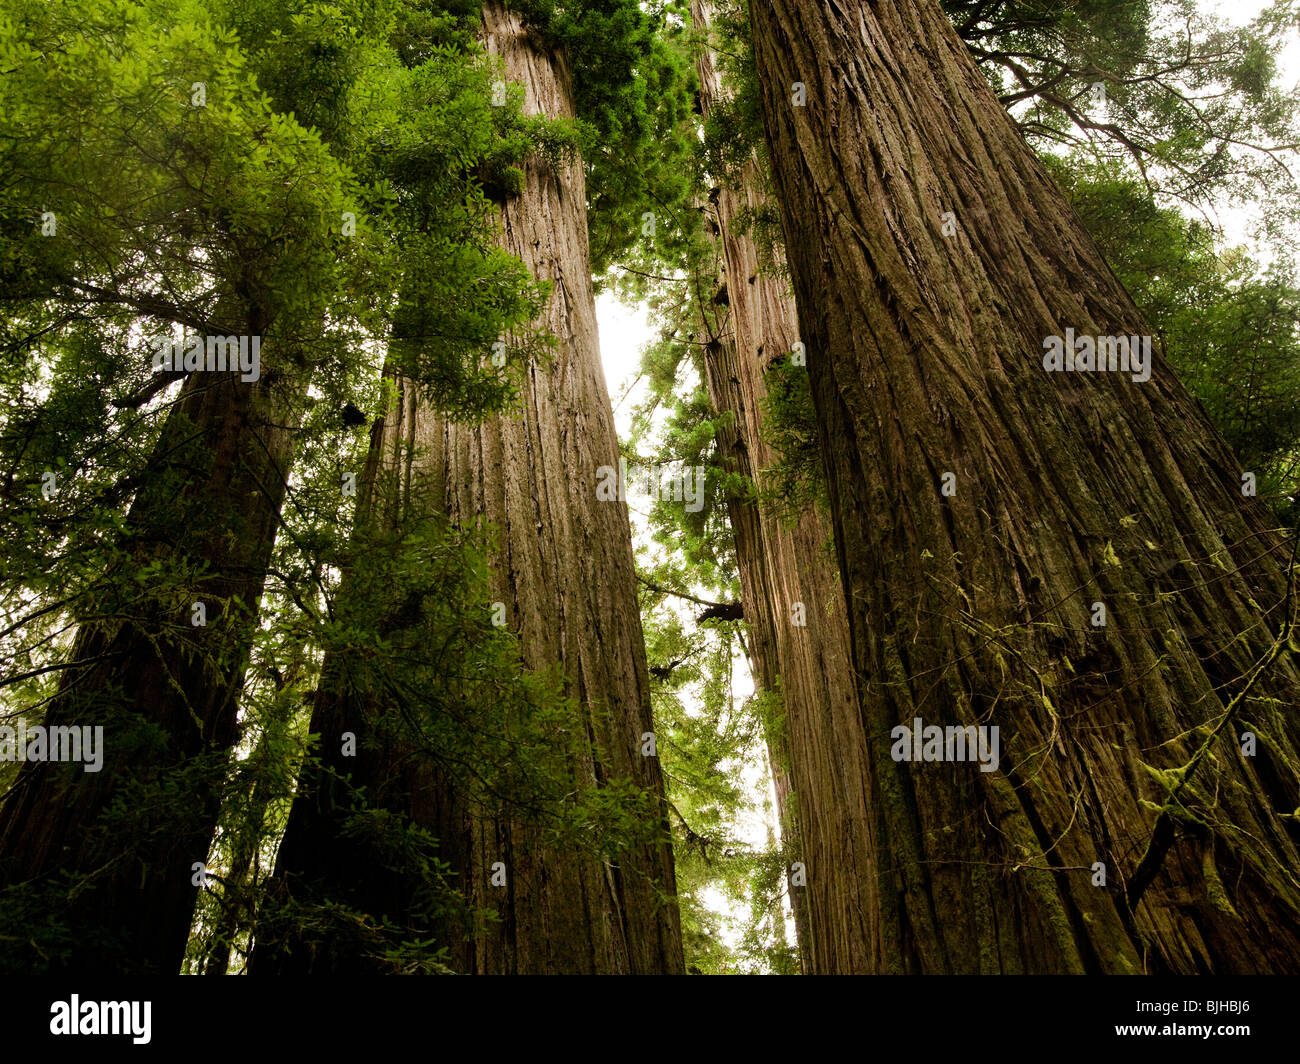 giant redwoods - Stock Image